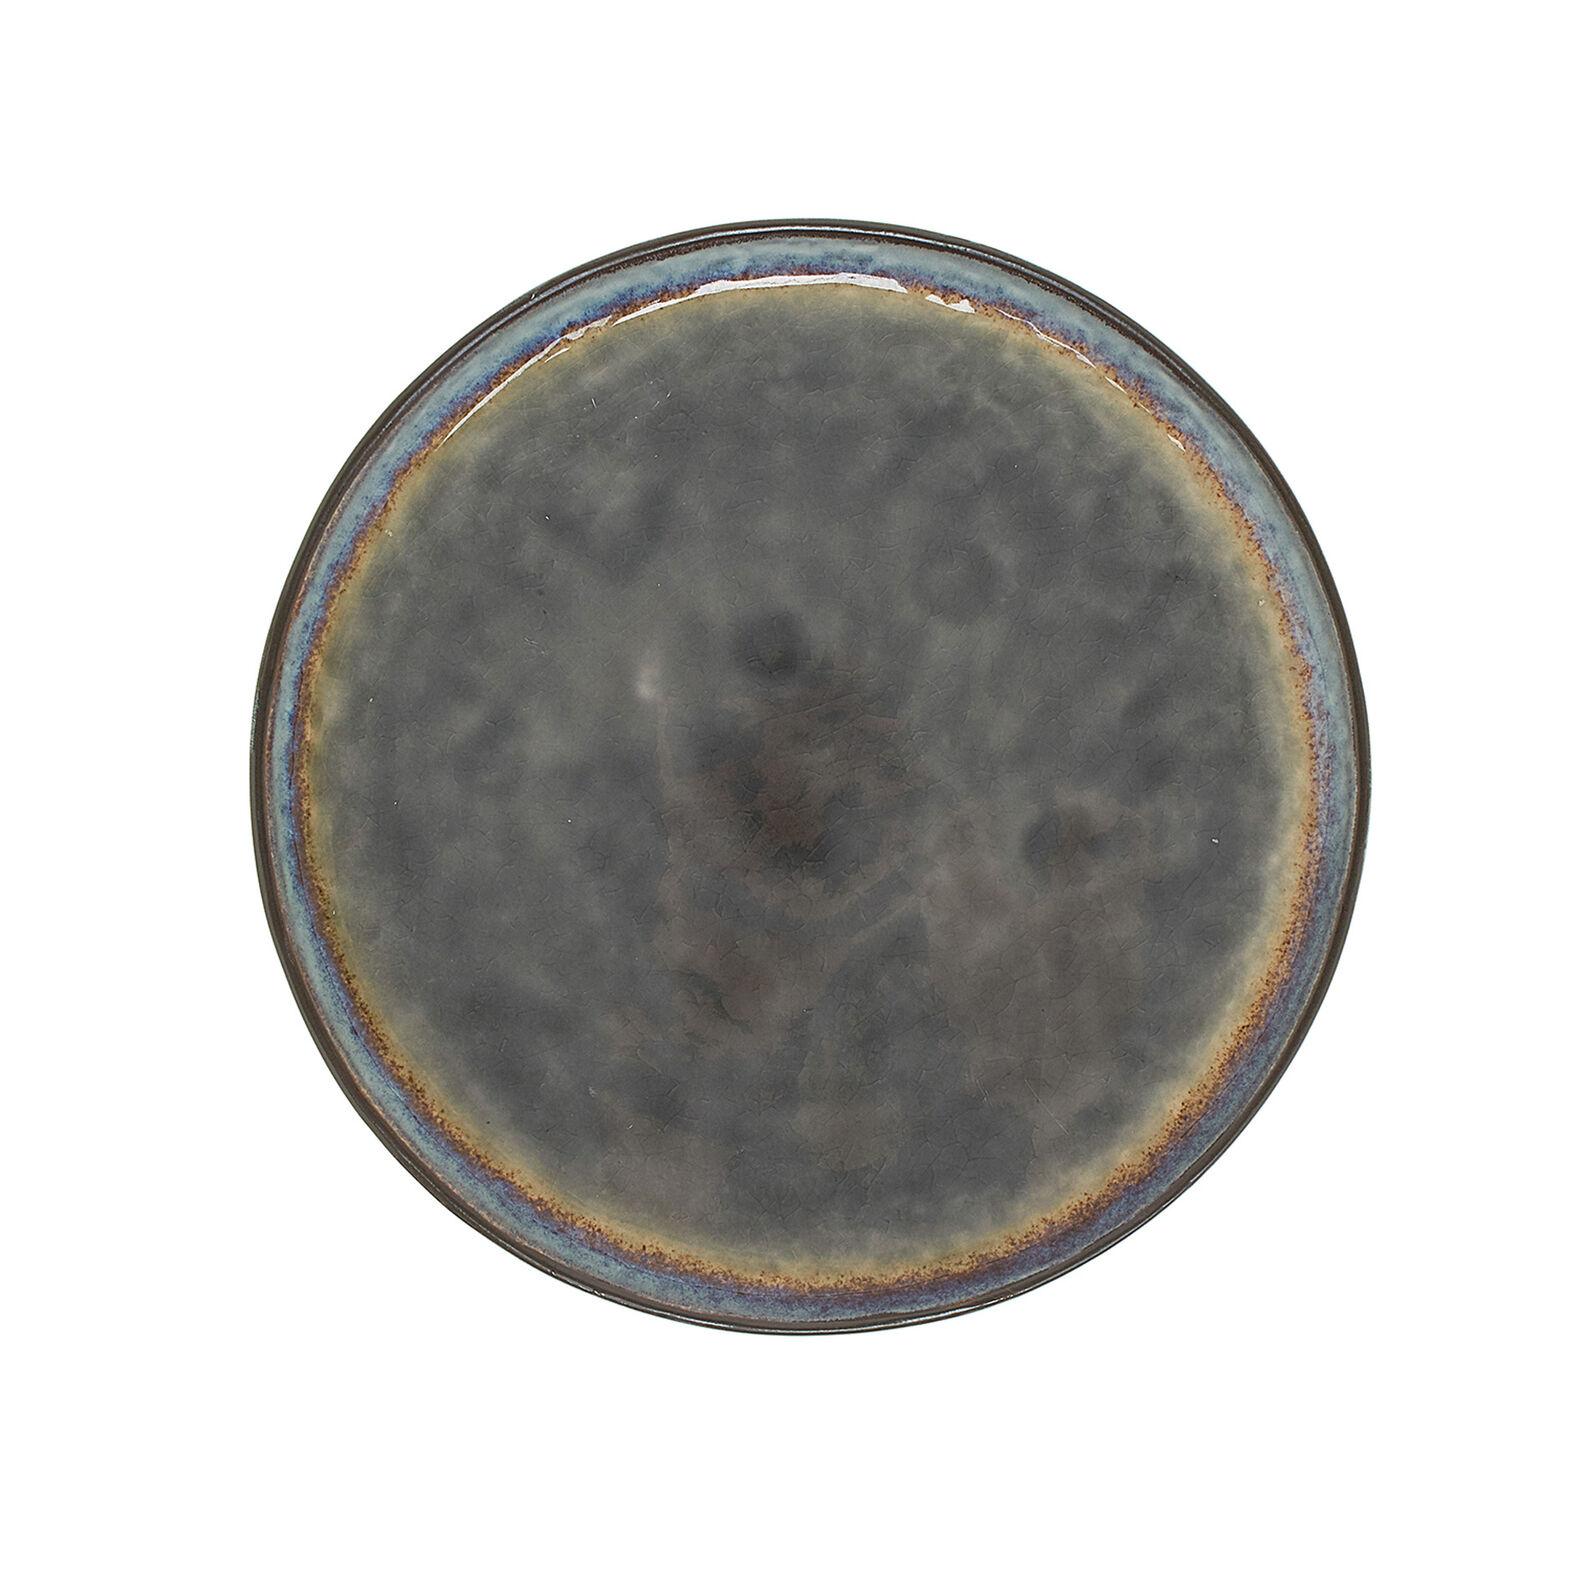 Stoneware plate with reactive glaze